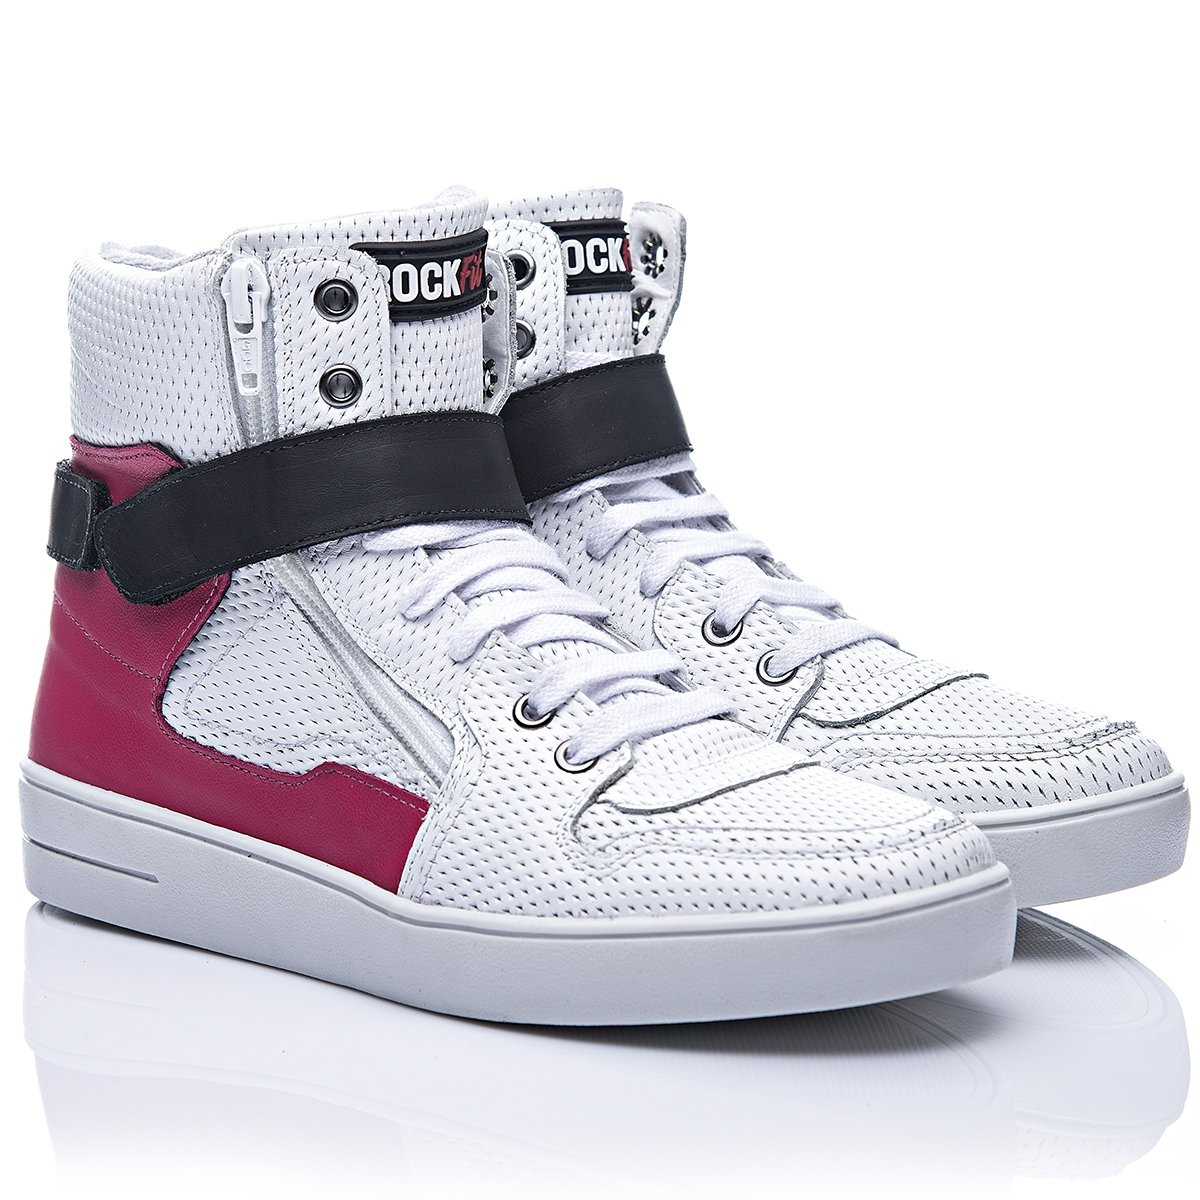 Rosa Fit Em Rosa Branco Couro Rock Tenis e Branco Seattle 4v6nwq